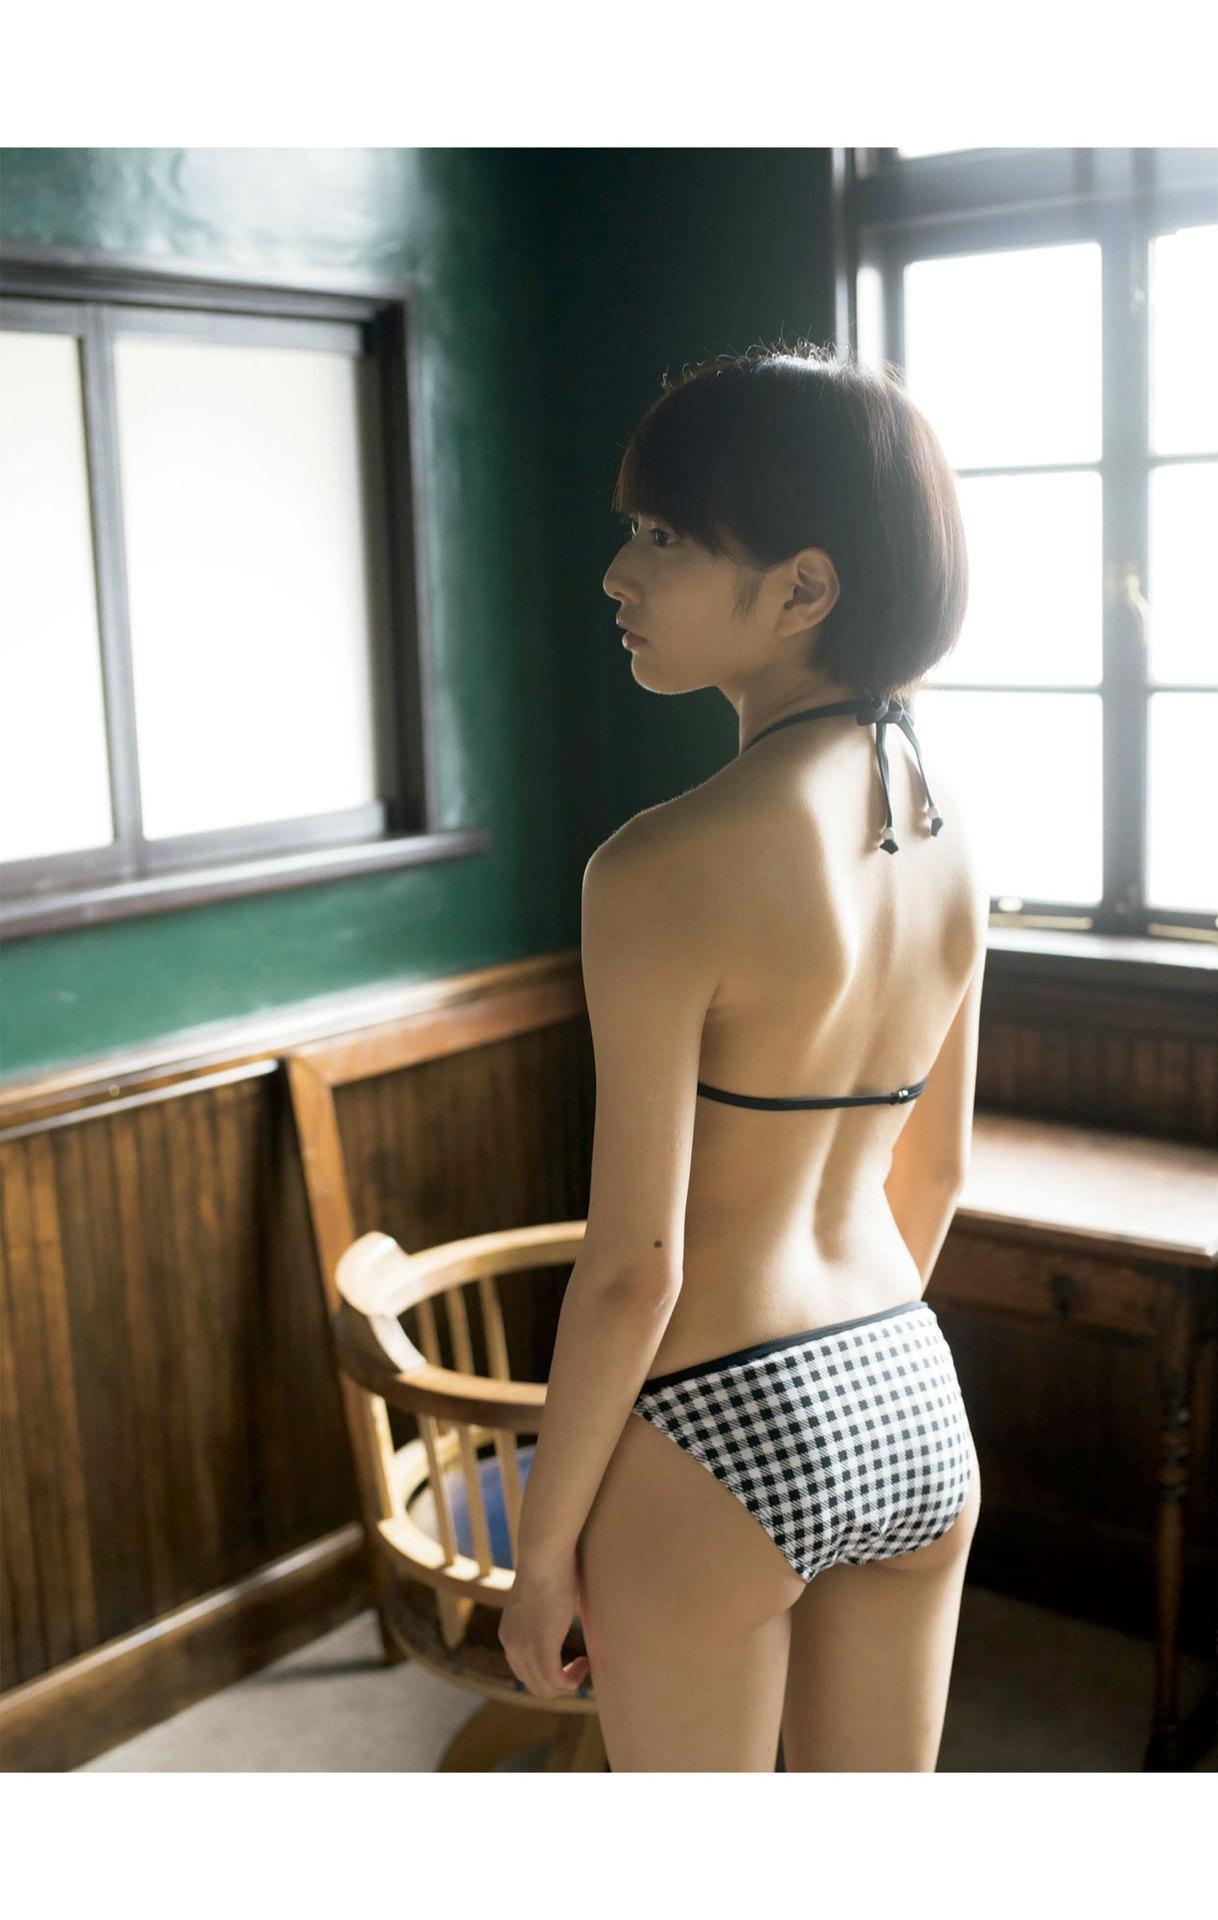 Summer Vacation Uniform After School Youth Bikini063